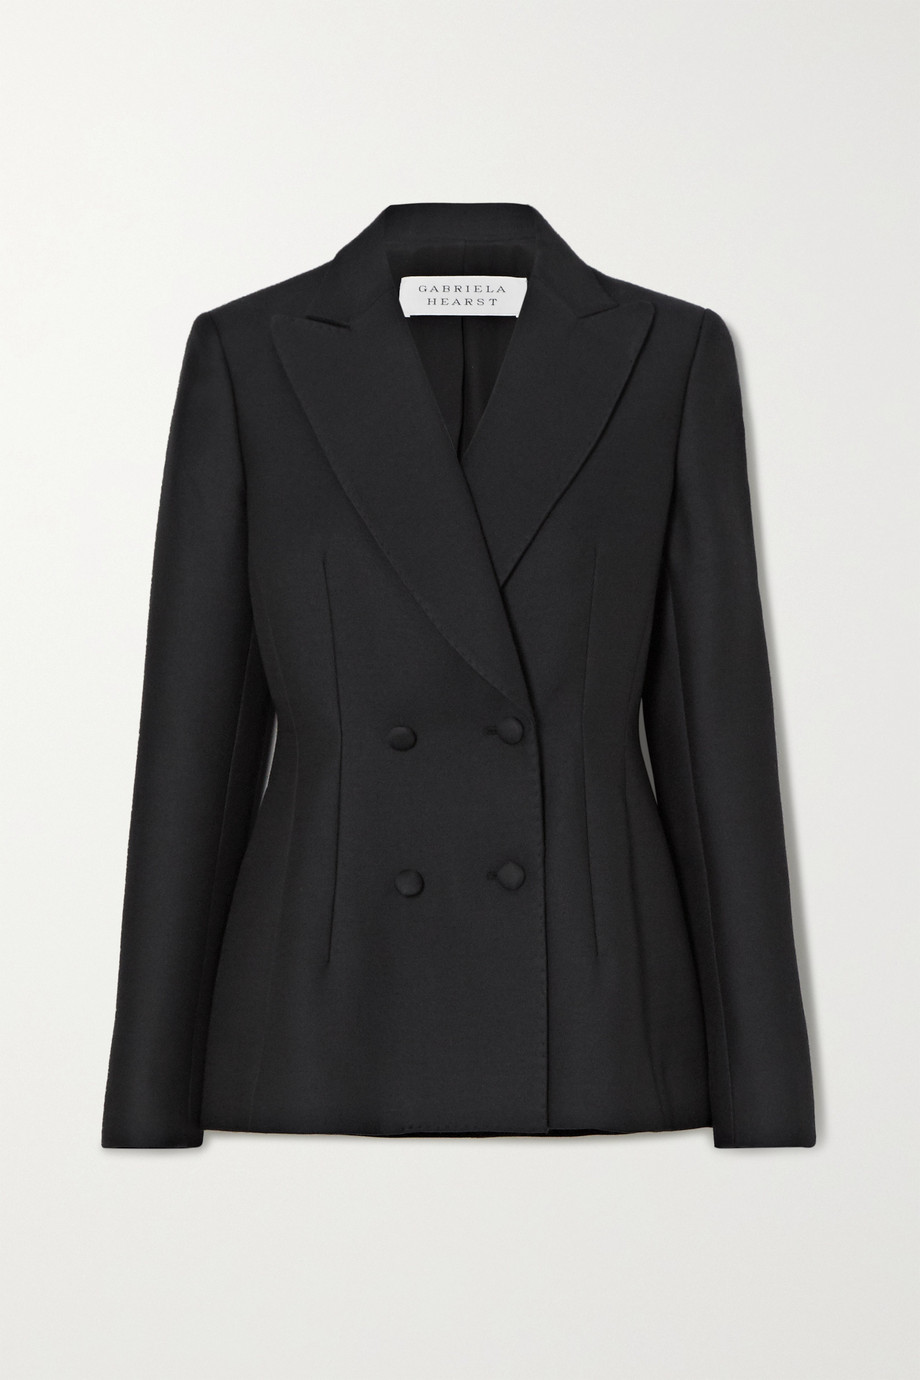 Gabriela Hearst Rezi double-breasted wool-cady blazer